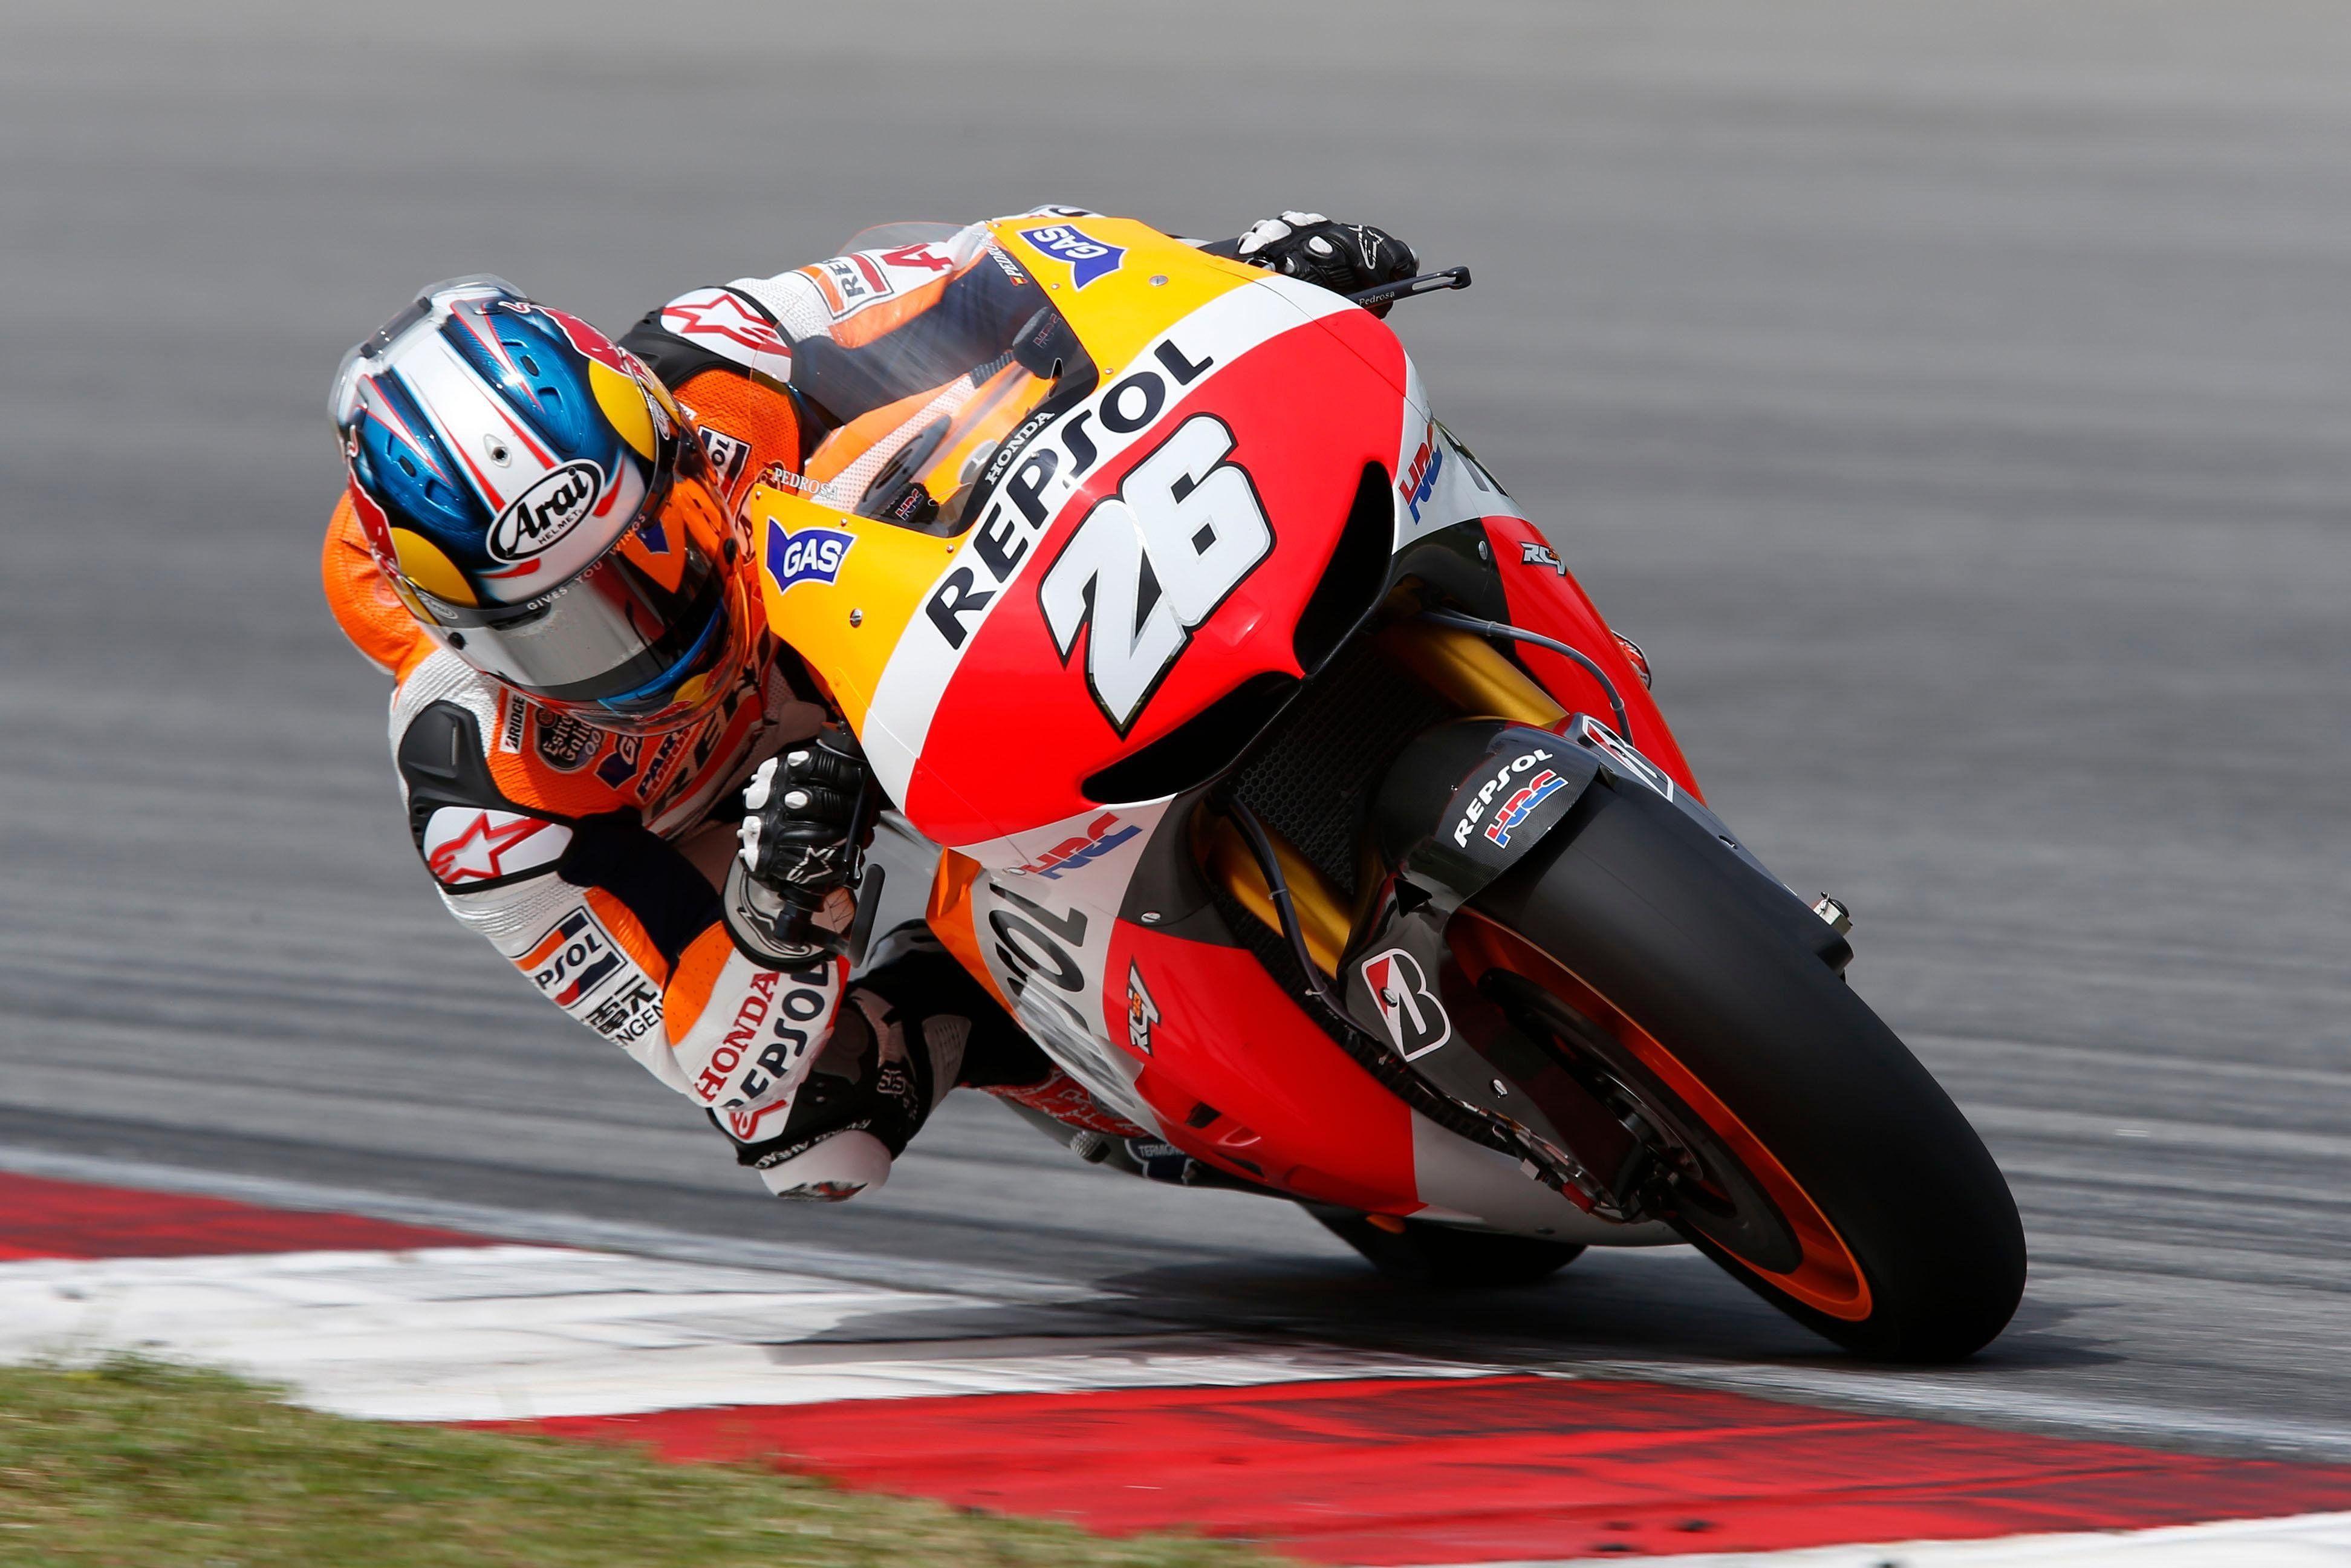 26 Dani Pedrosa (ESP, Repsol Honda Team, 2013) Motogp